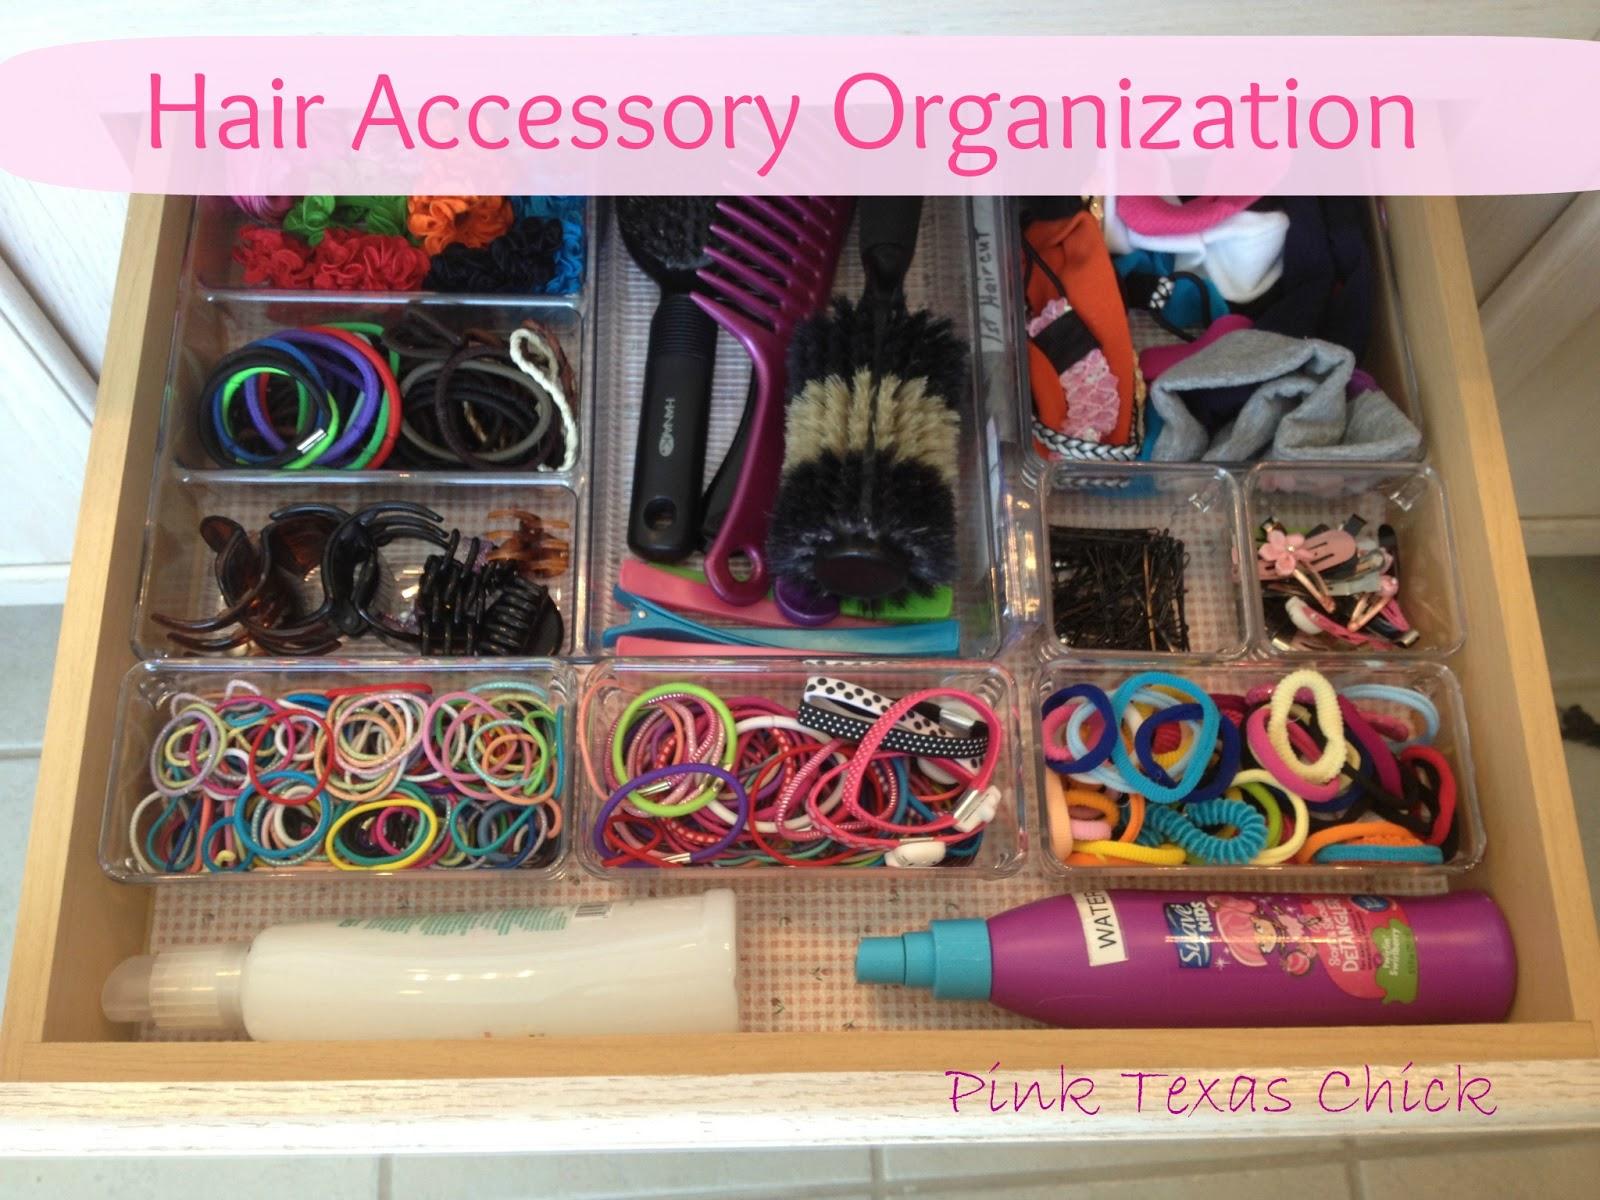 pink texas chick organizing da hair accessories. Black Bedroom Furniture Sets. Home Design Ideas